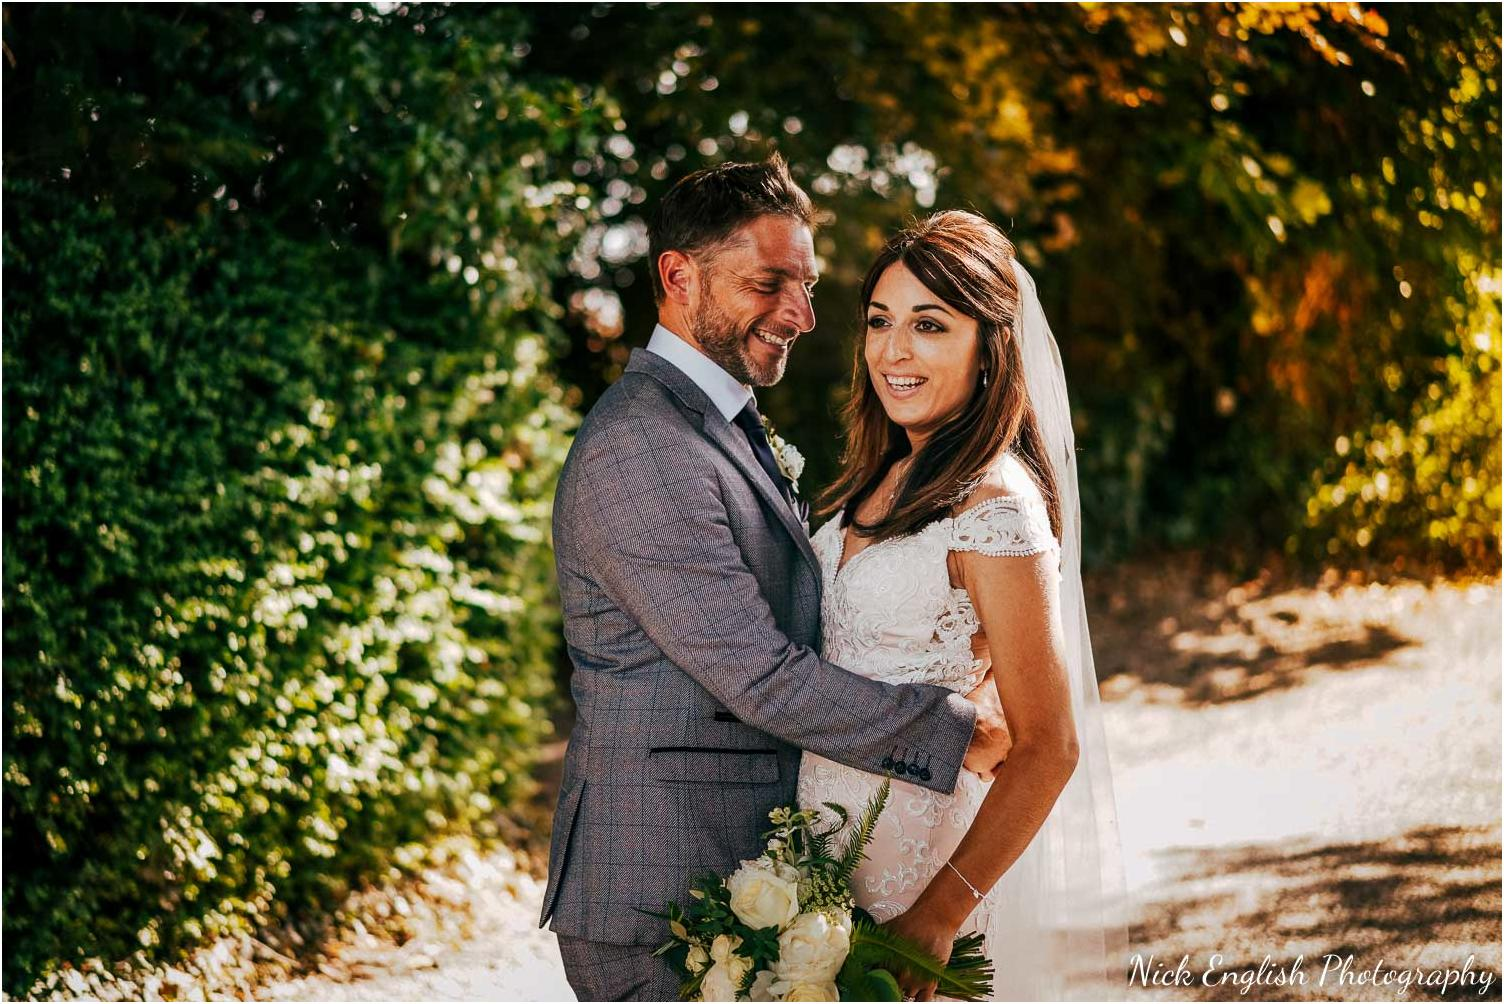 Mitton_Hall_Wedding_Photographer-70.jpg